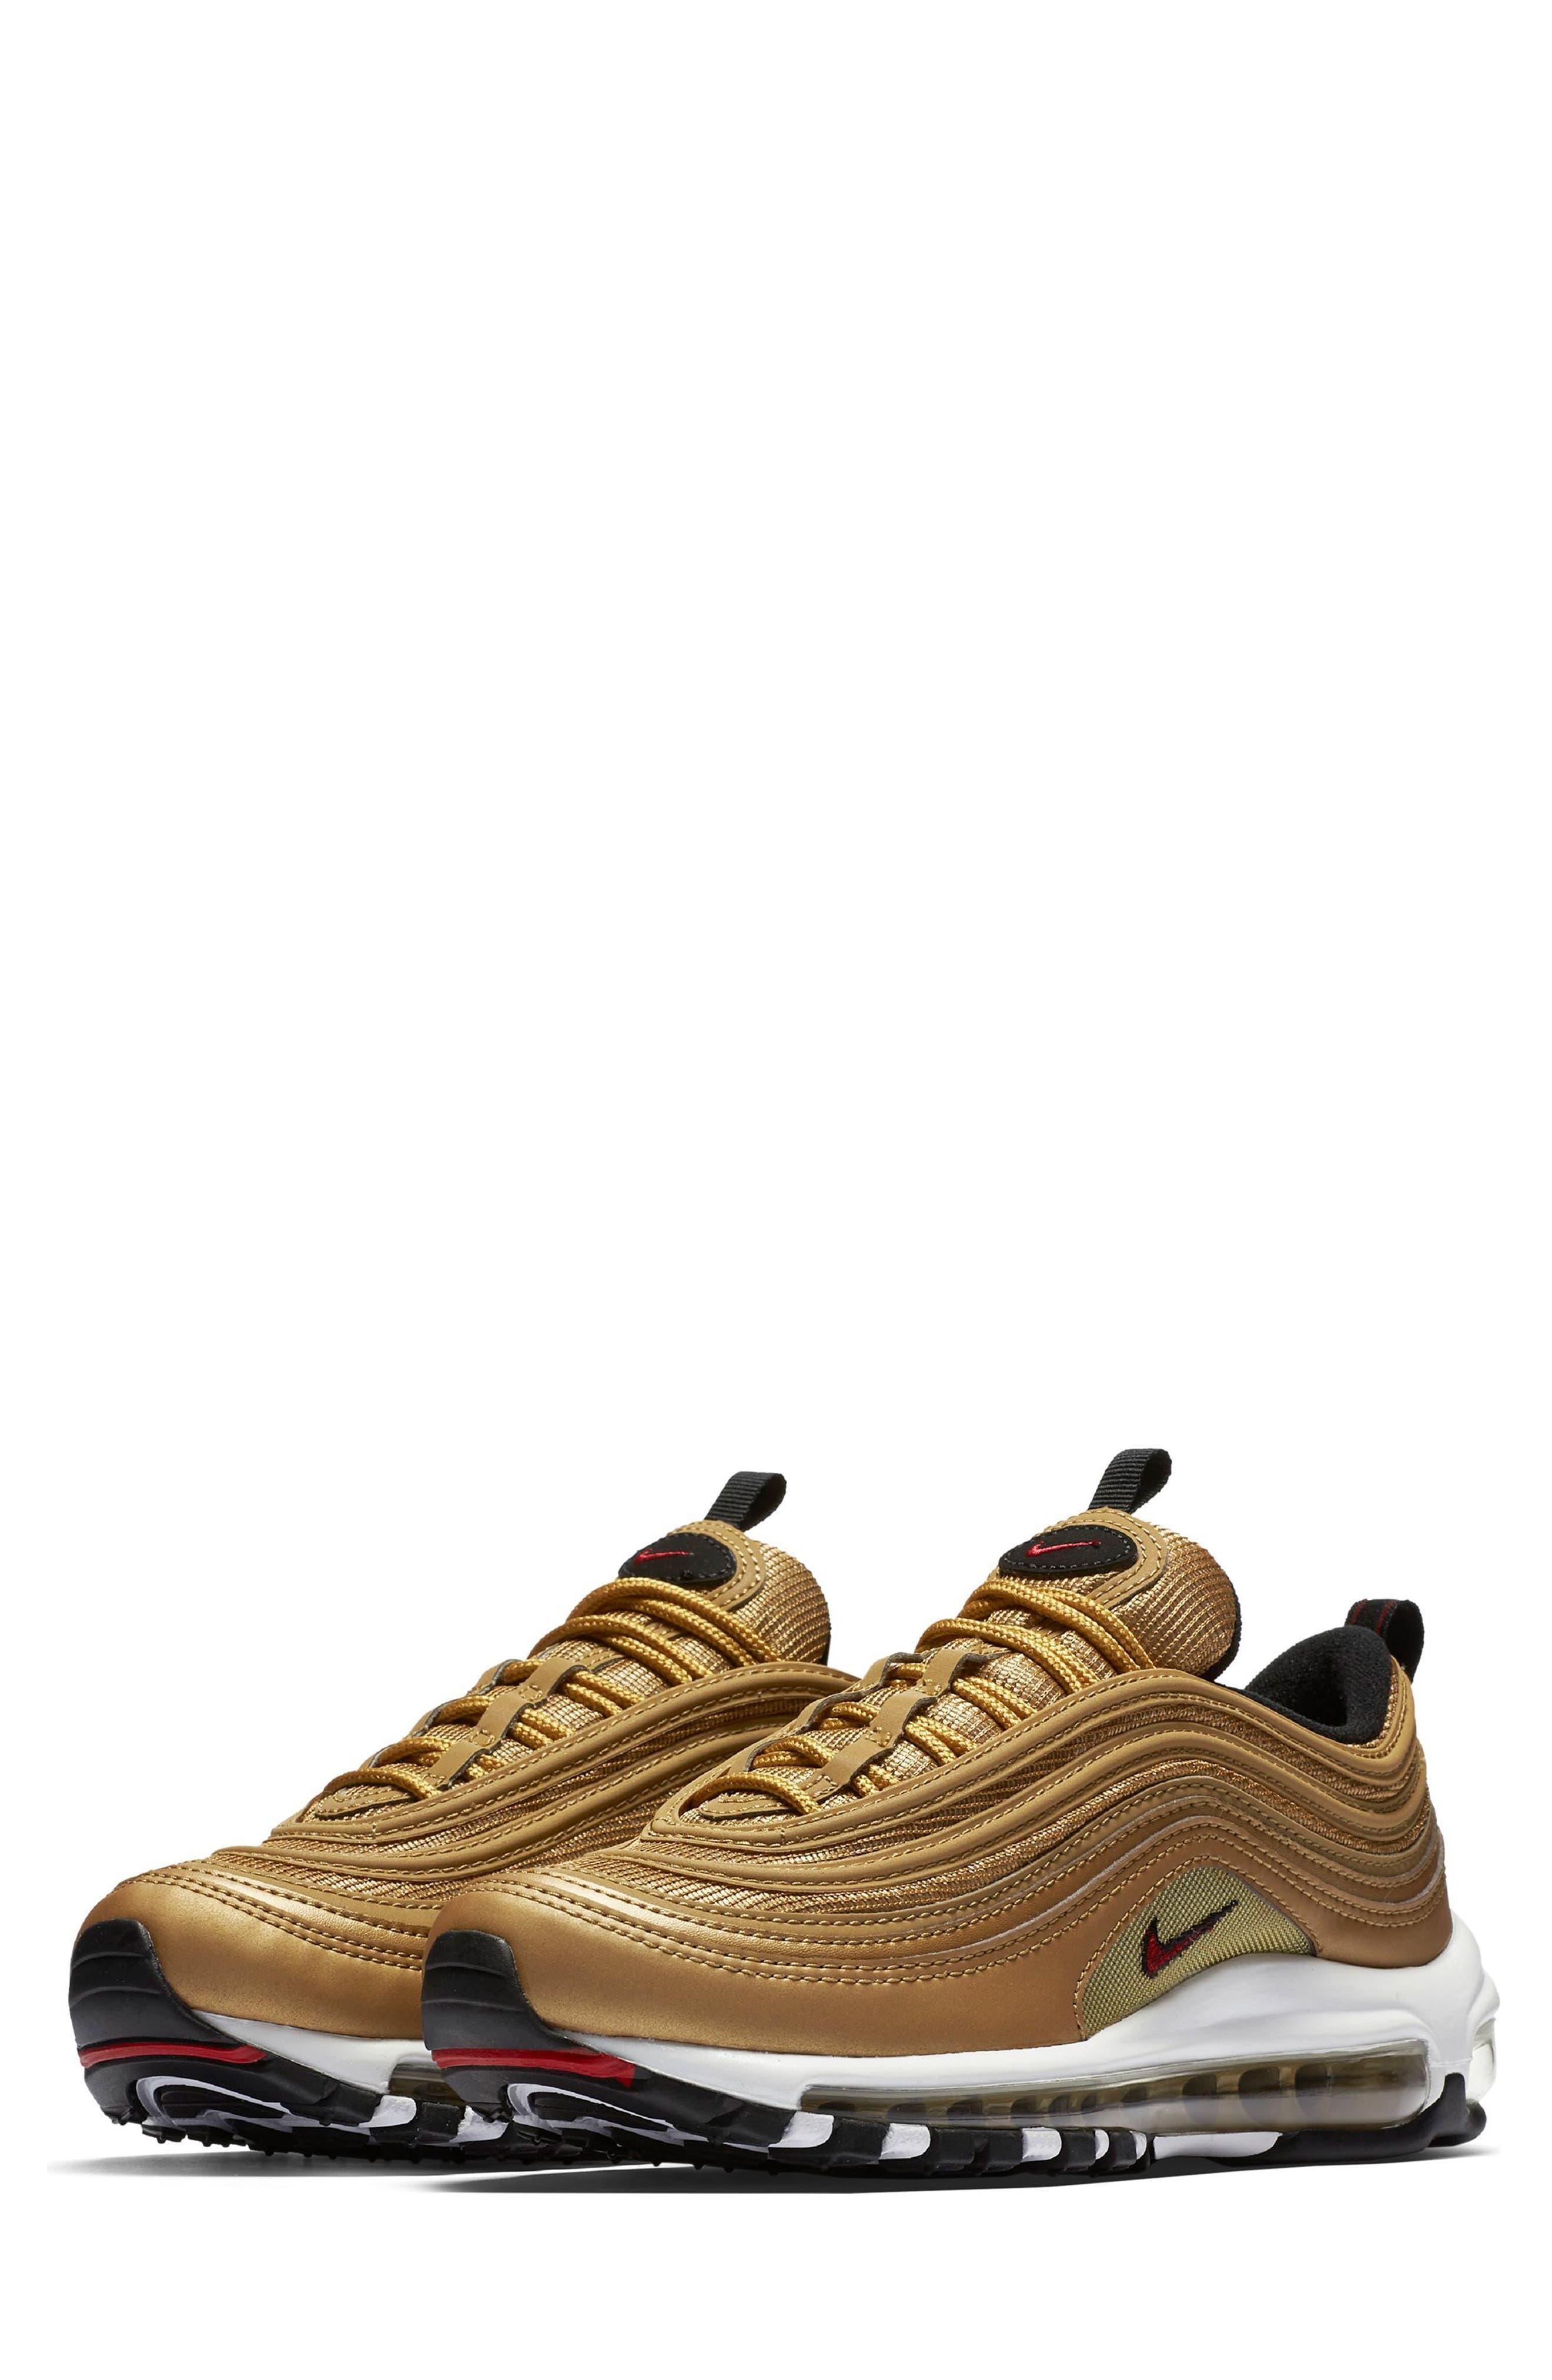 Air Max 97 OG Sneaker,                             Main thumbnail 1, color,                             Gold/ Red/ White/ Black